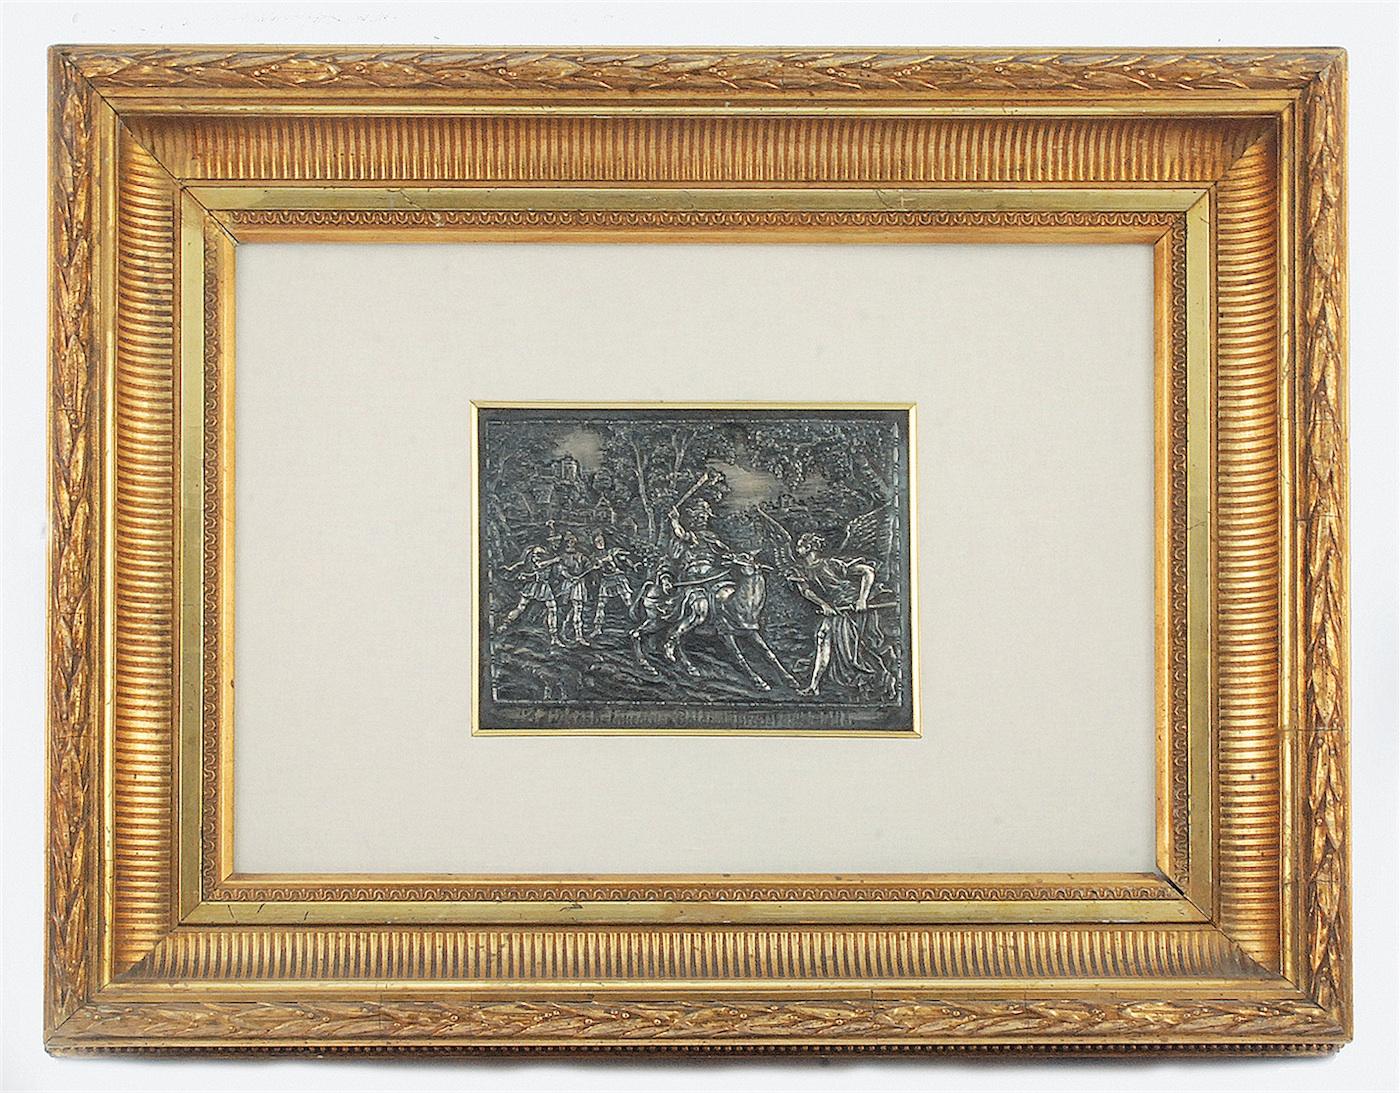 Plakieta srebrna ze sceną biblijną